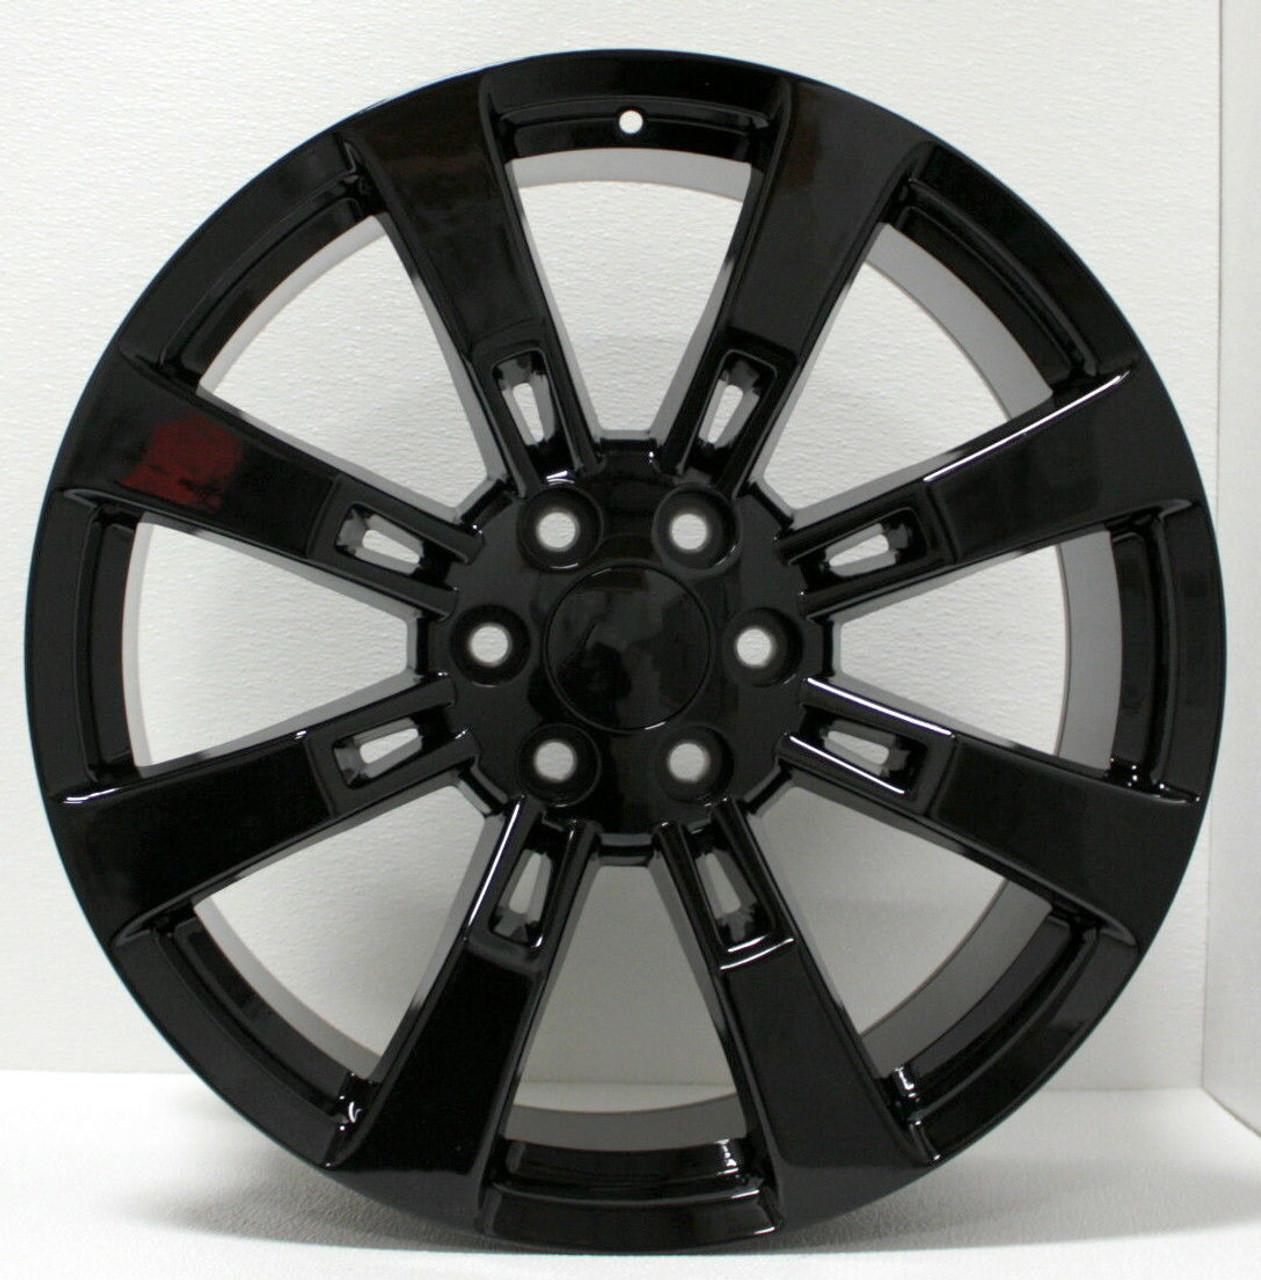 Gmc Black Eight Spoke 22 Inch Wheels Rims